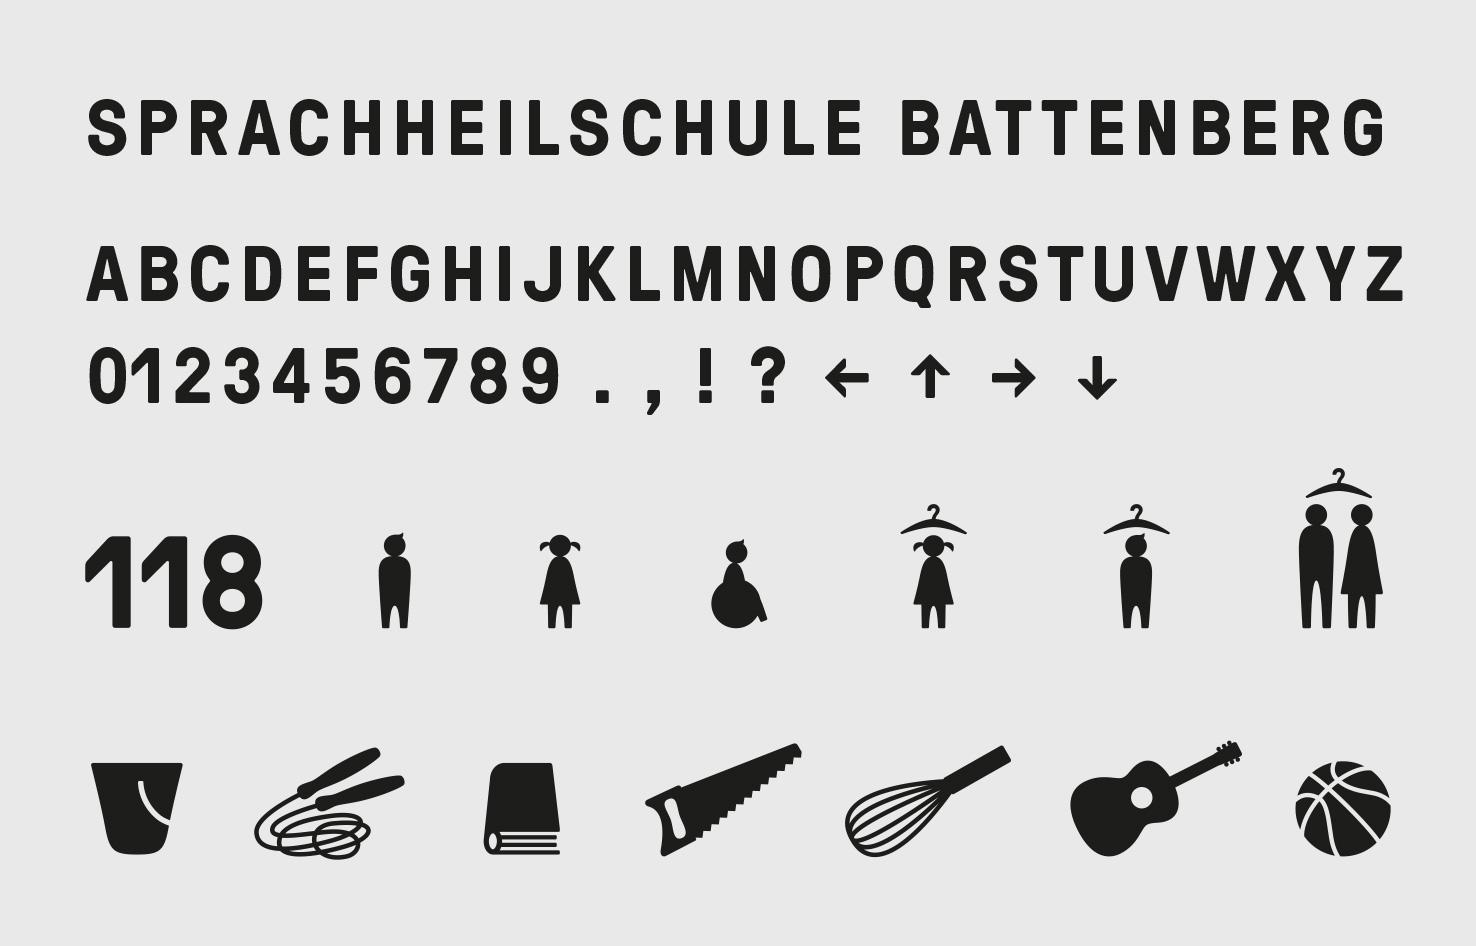 Manual Signaletik Piktogramme Schule Battenberg